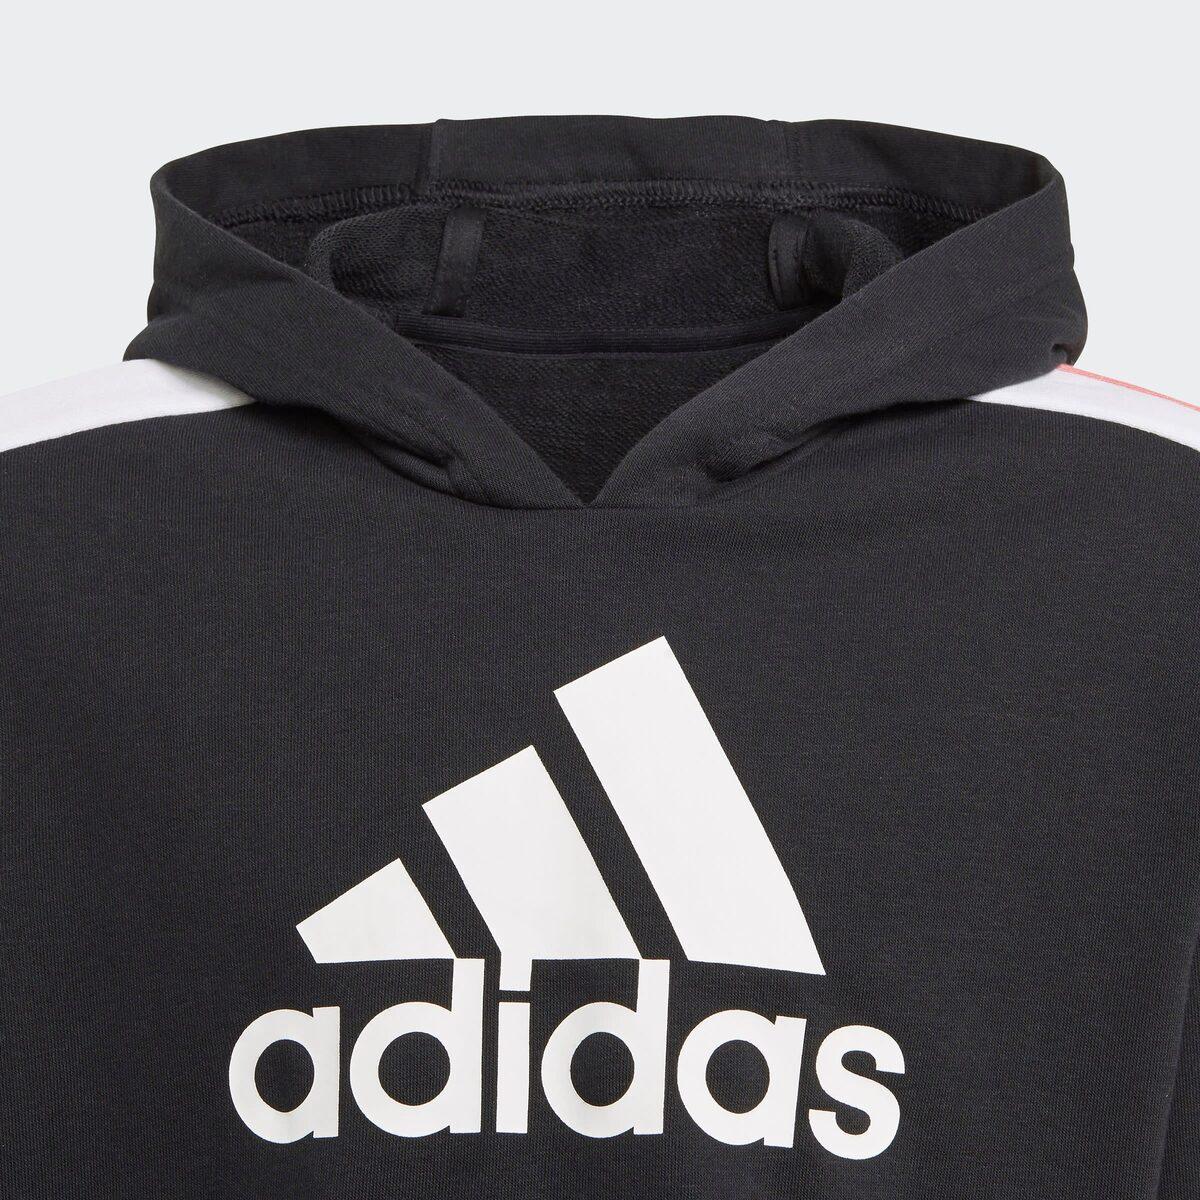 Bild 5 von adidas Performance Trainingsanzug »COLORBLOCK CROP TOP«